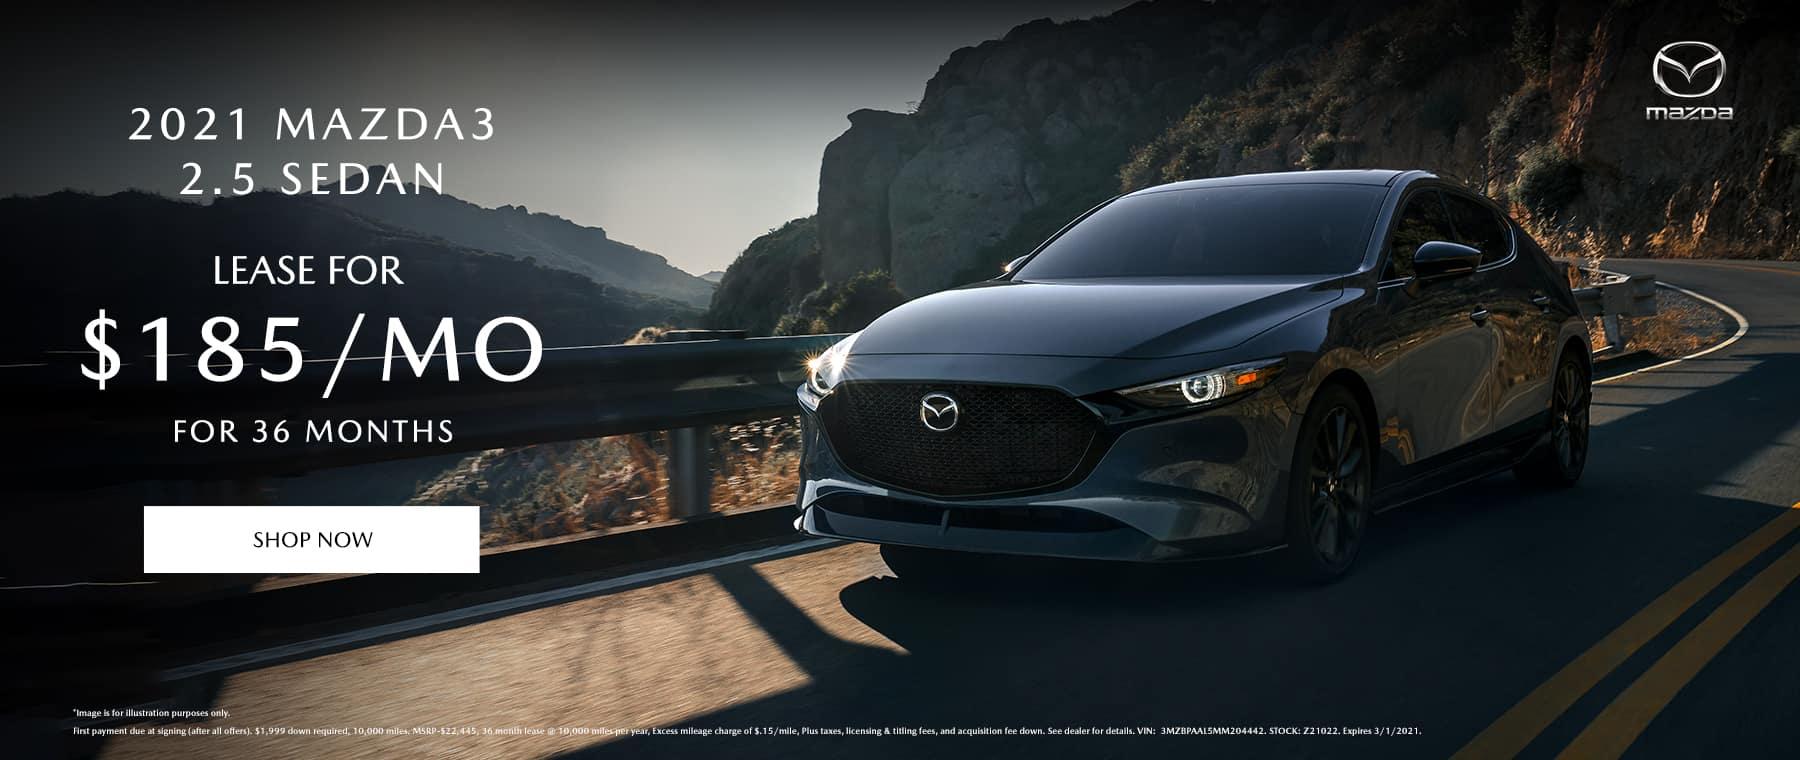 2021 Mazda3 2.5 Sedan $185/Month for 36 Months